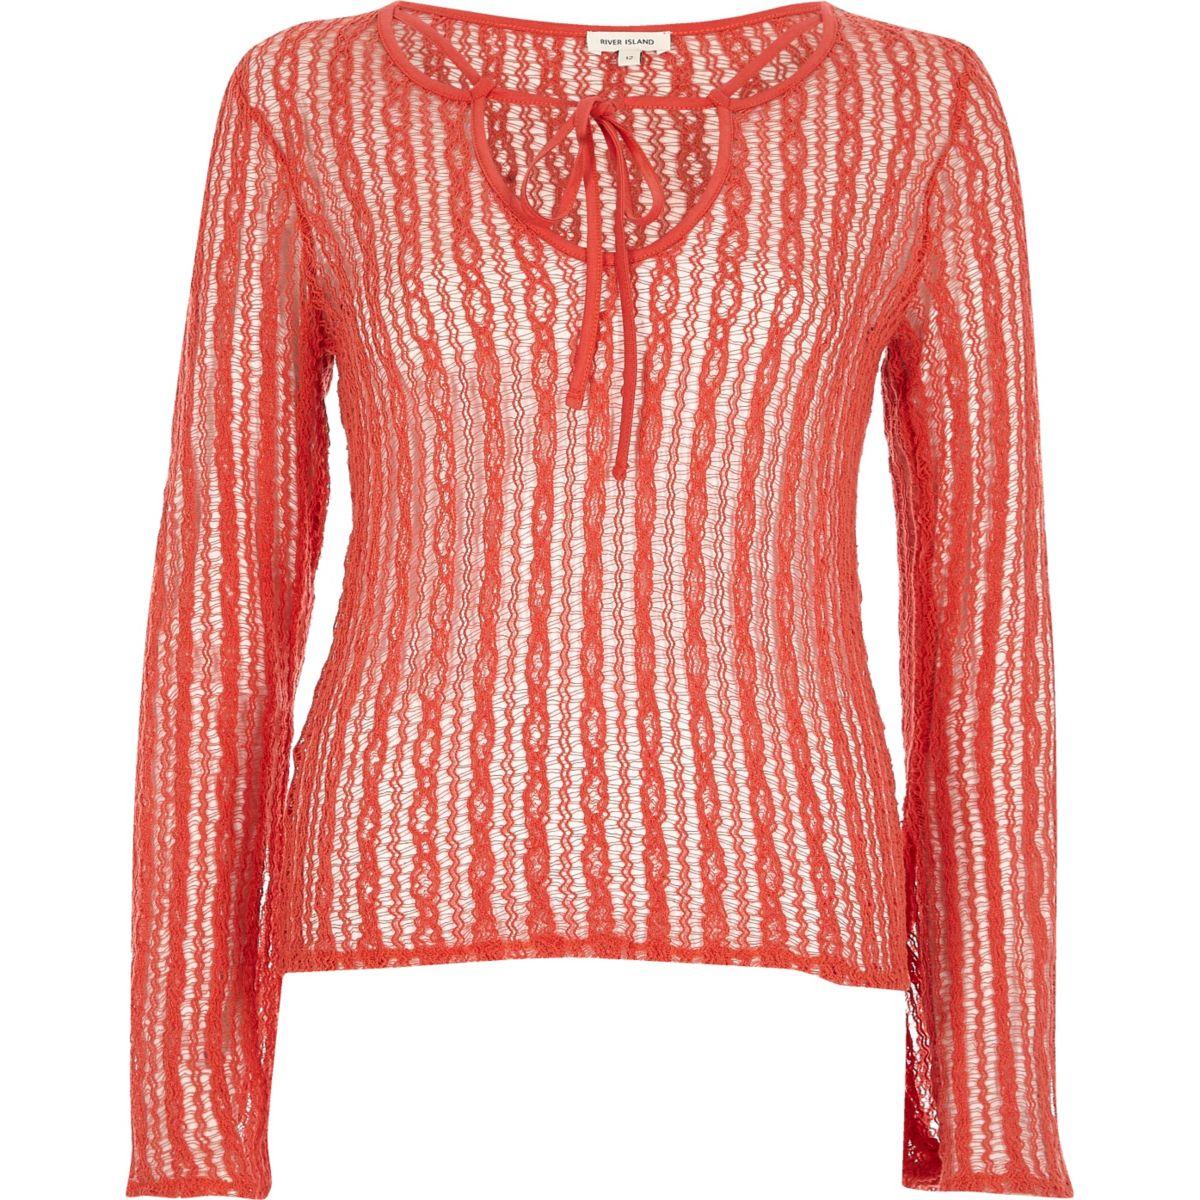 Orange open mesh lace-up front top